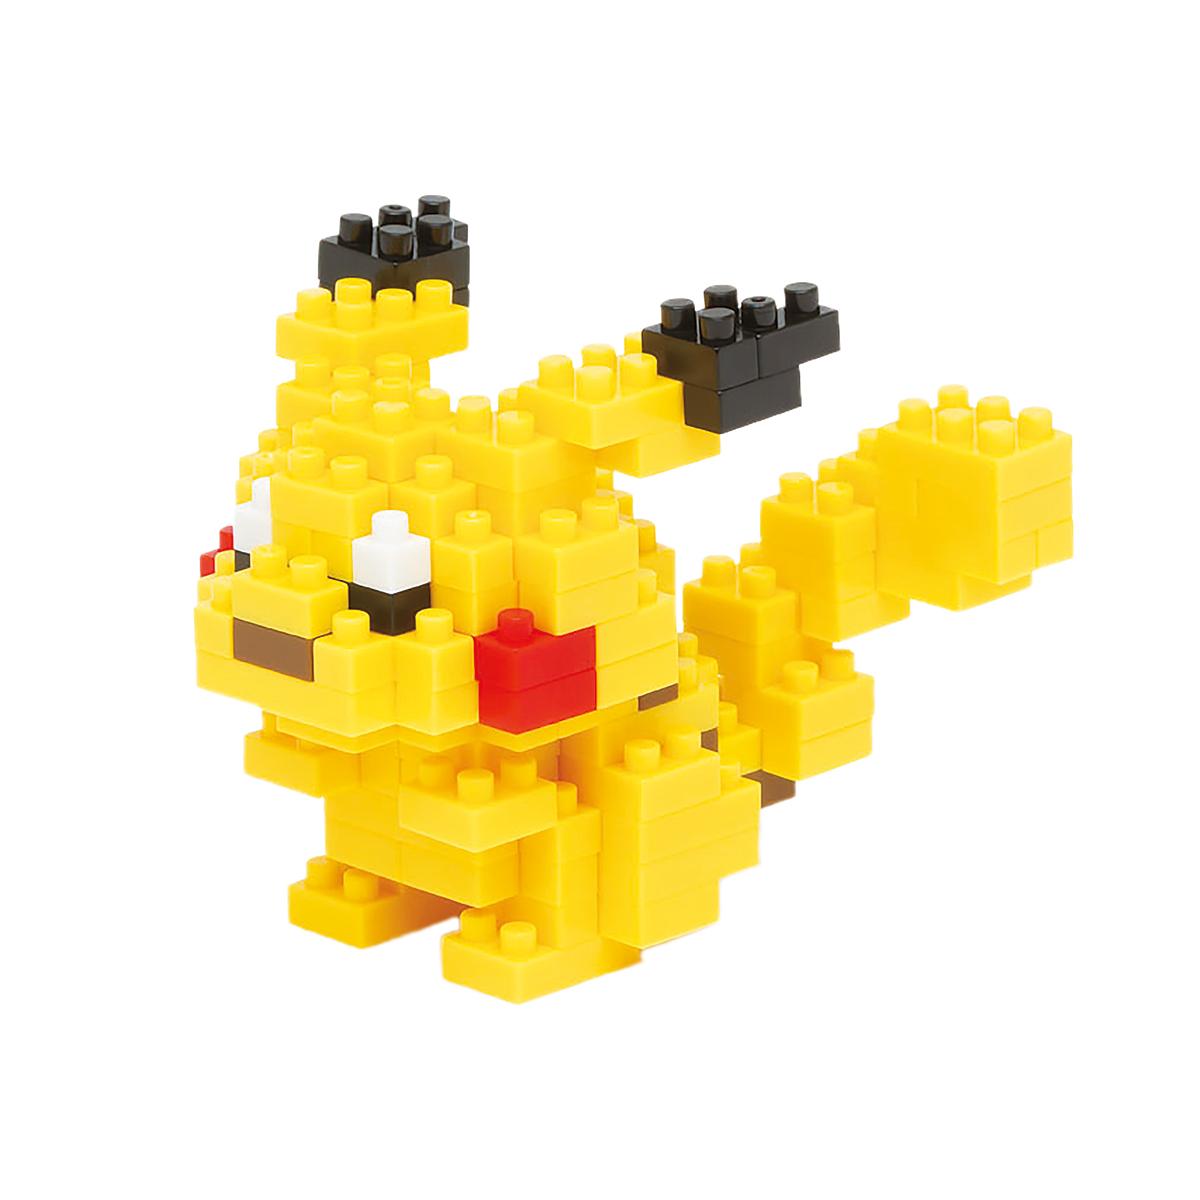 Pikachu nanoblock